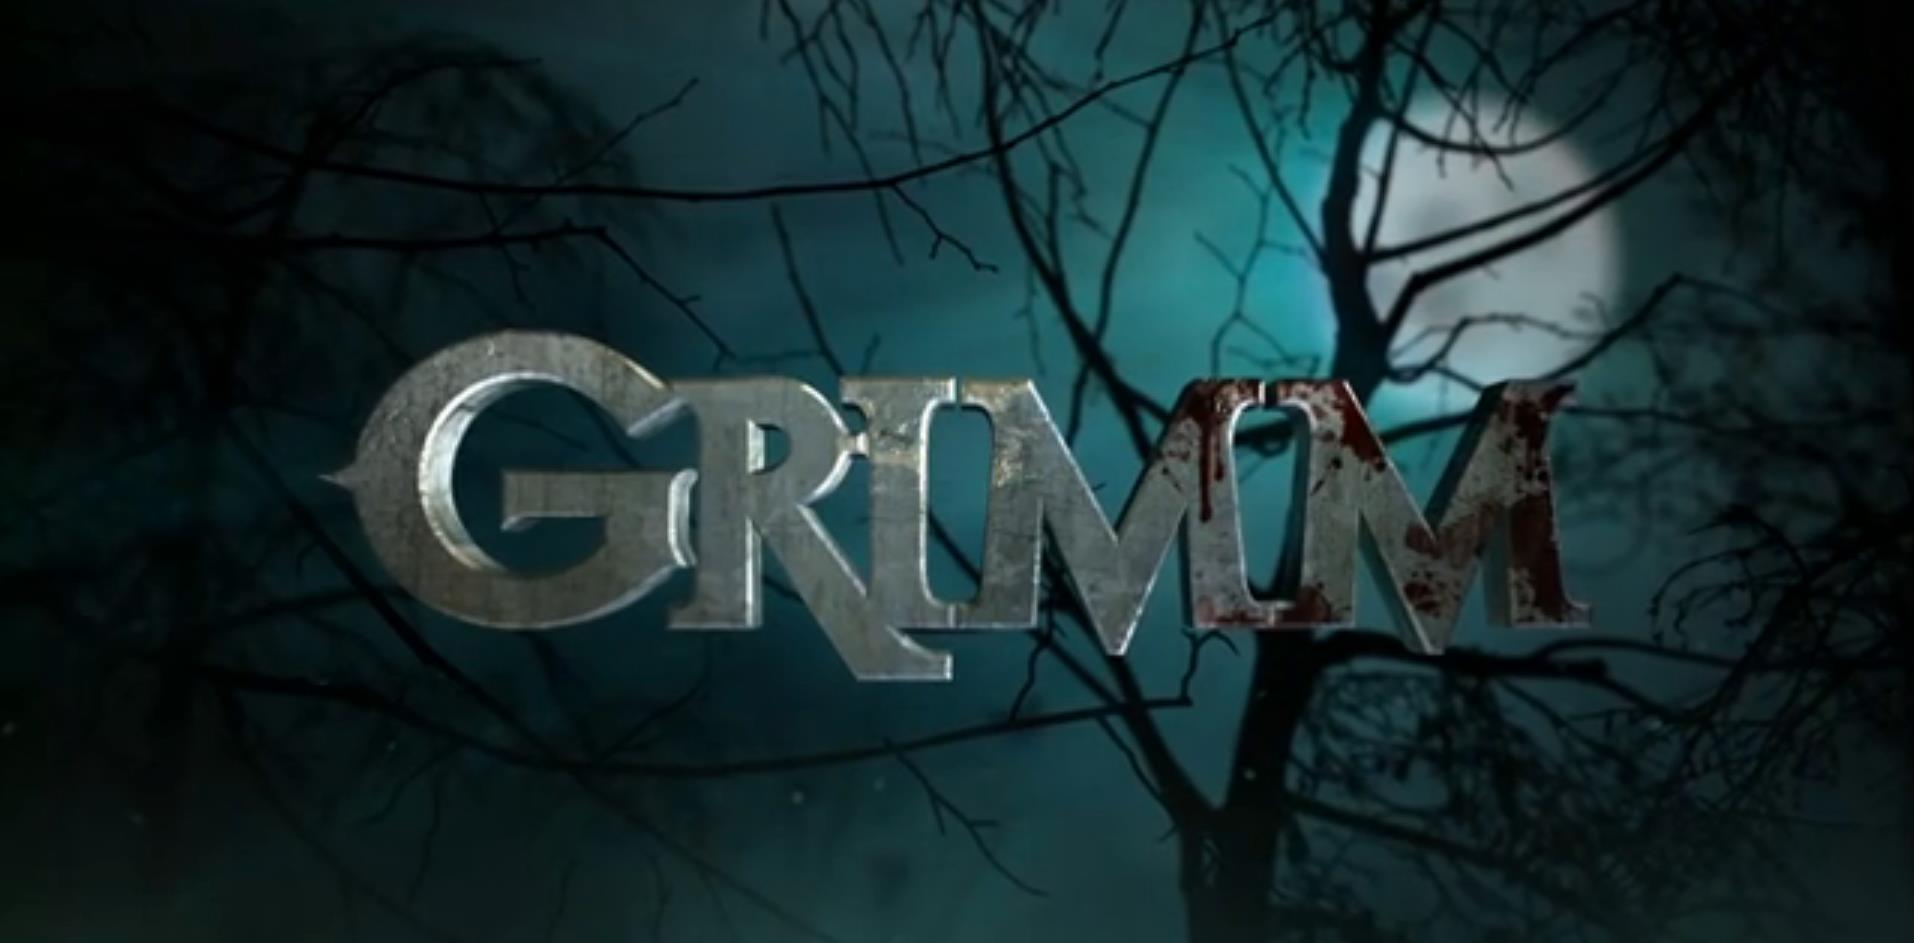 Plik:Grimm.jpg